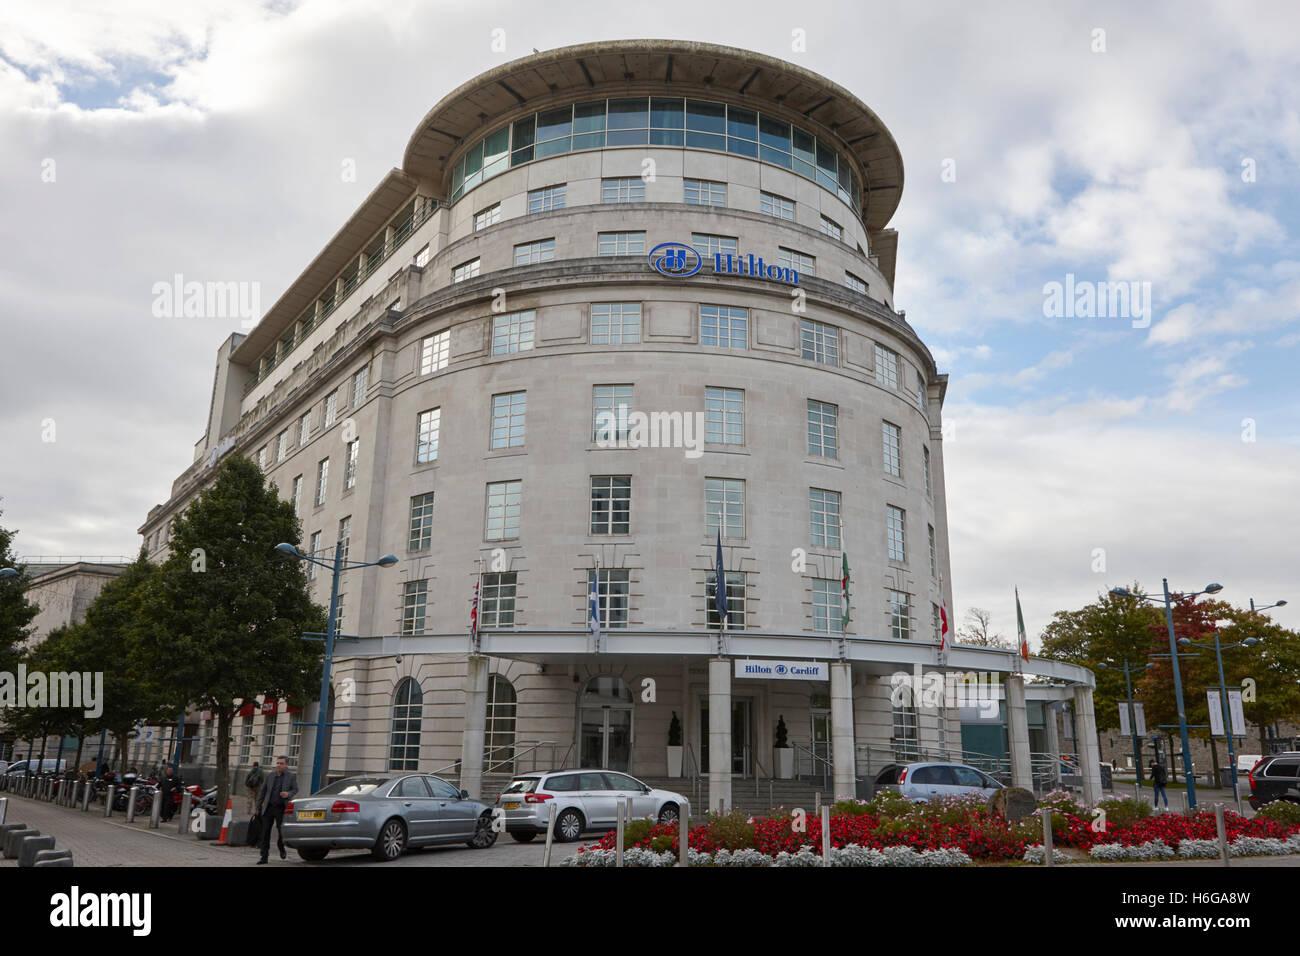 Cardiff hilton hotel Wales United Kingdom - Stock Image